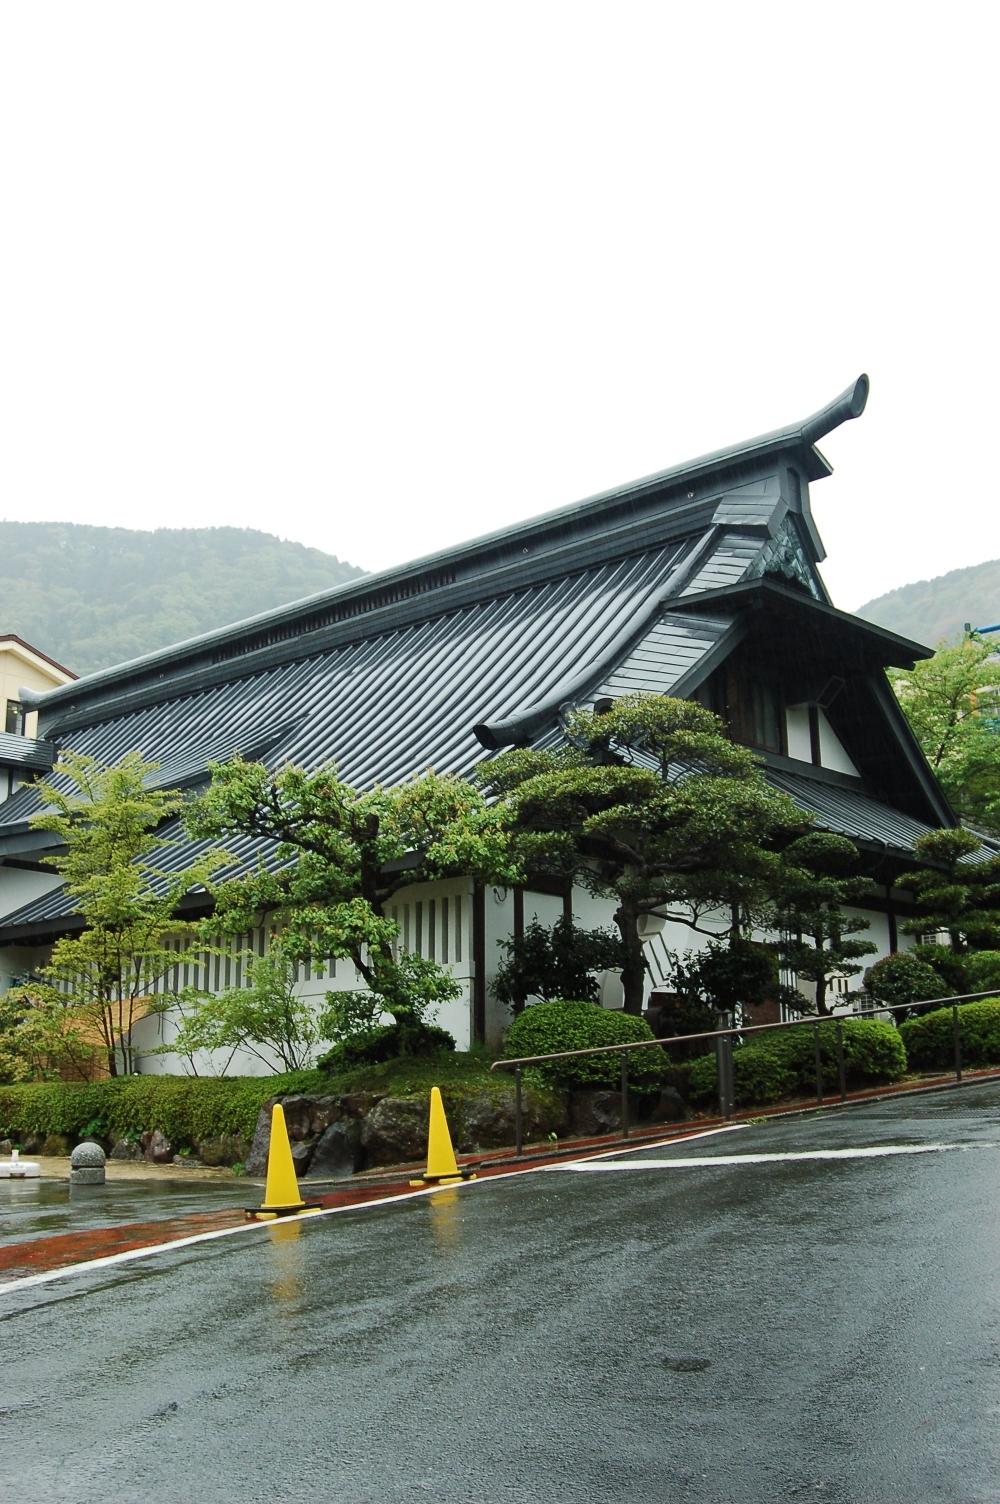 Japan, hakone, япония, хаконэ, National, Park, -, Fuji, Idzu